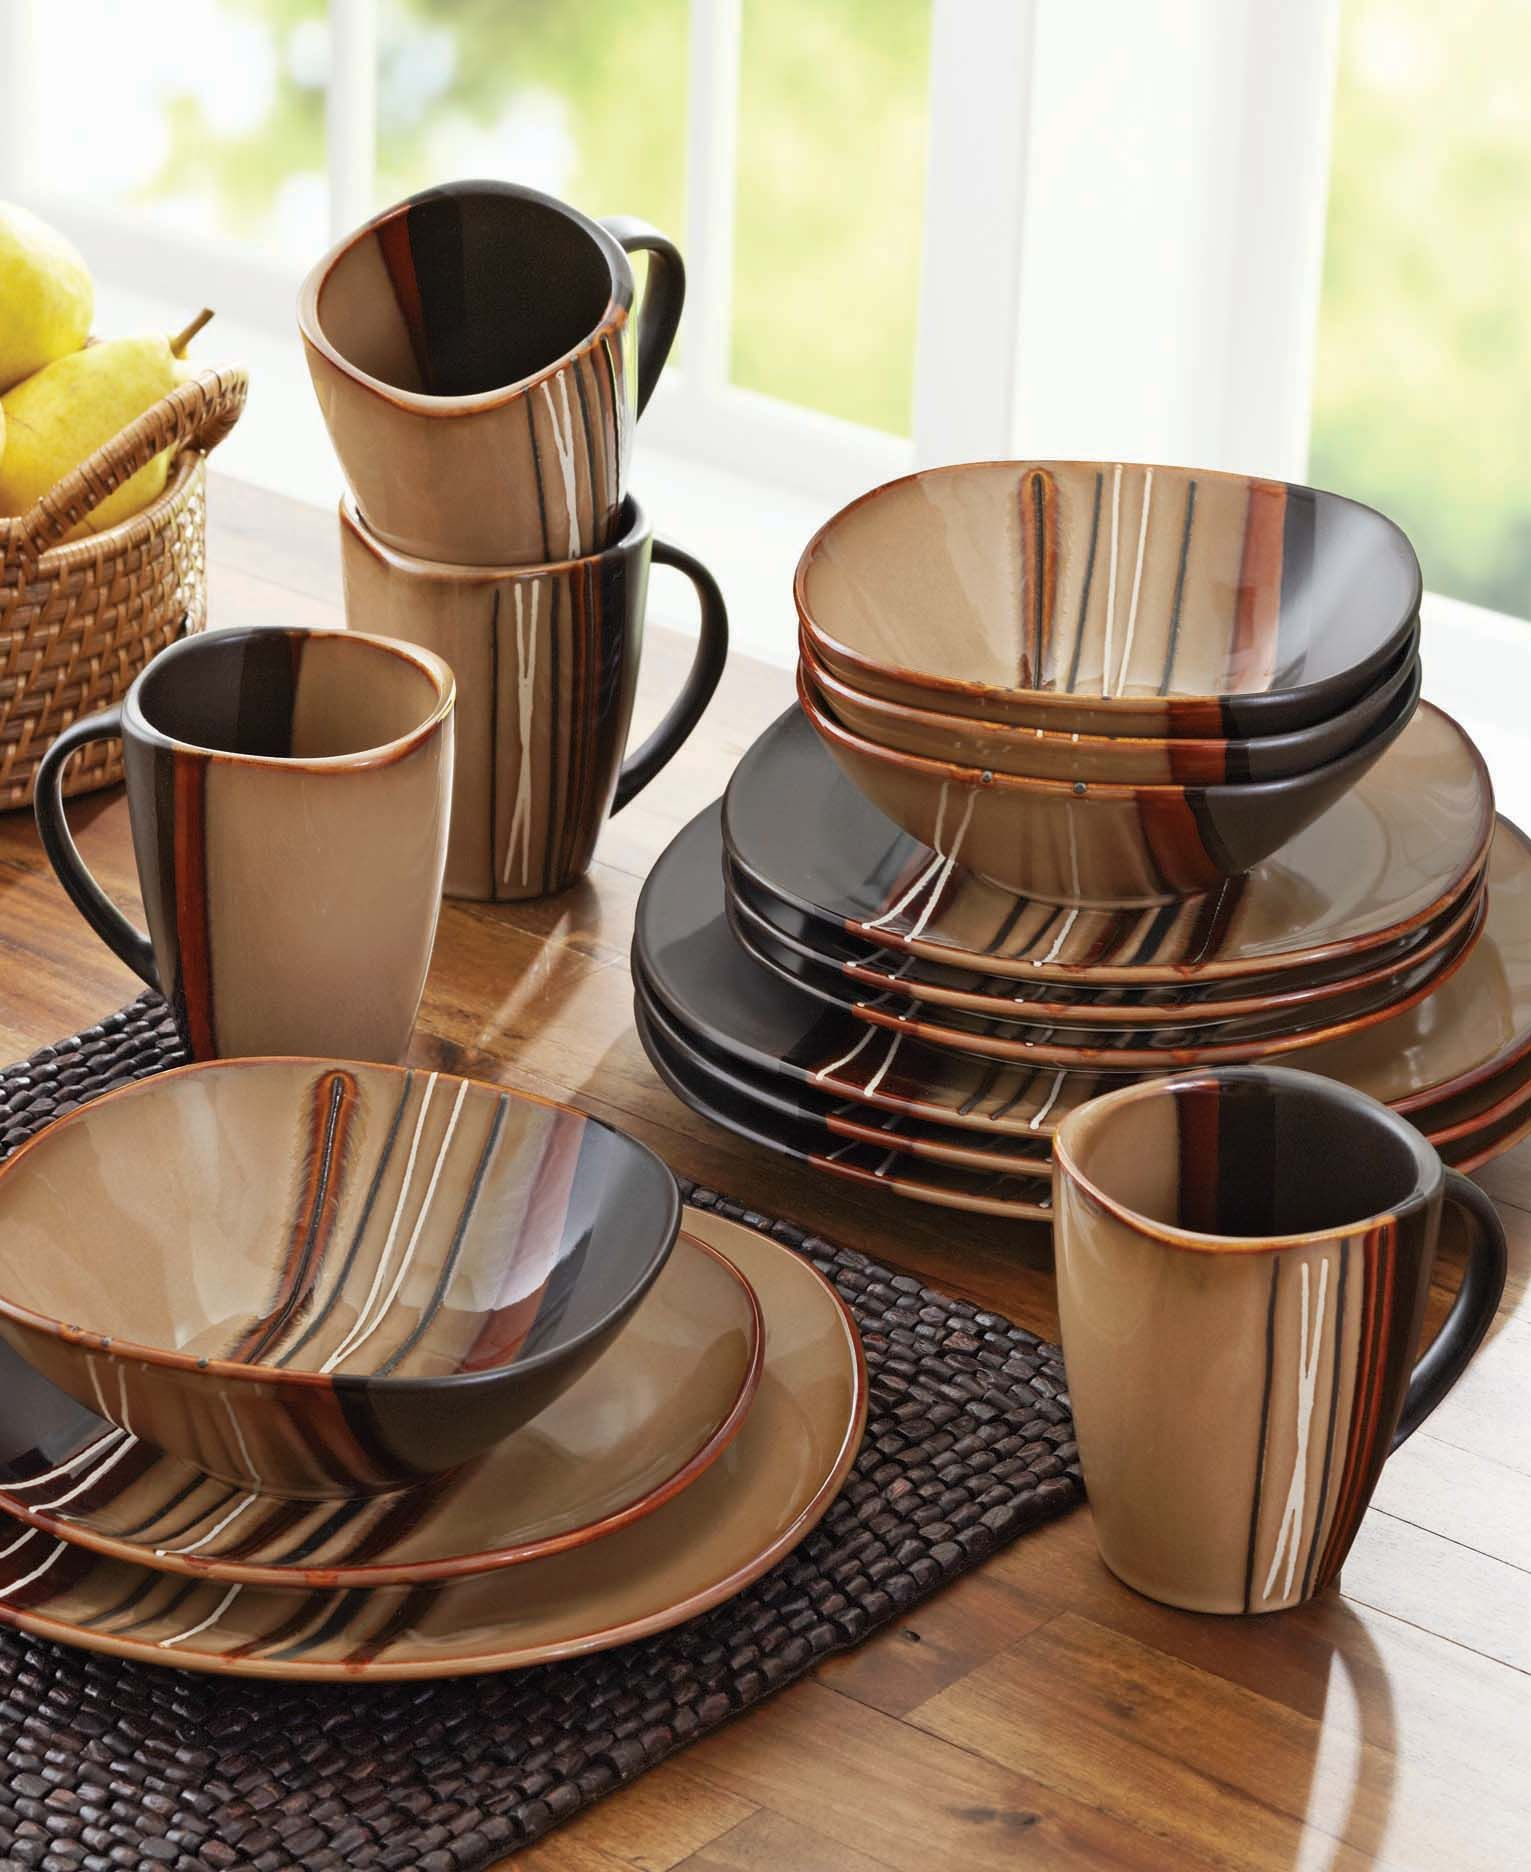 Home Dish Sets Dinnerware Dinnerware Set Dinnerware Set Modern